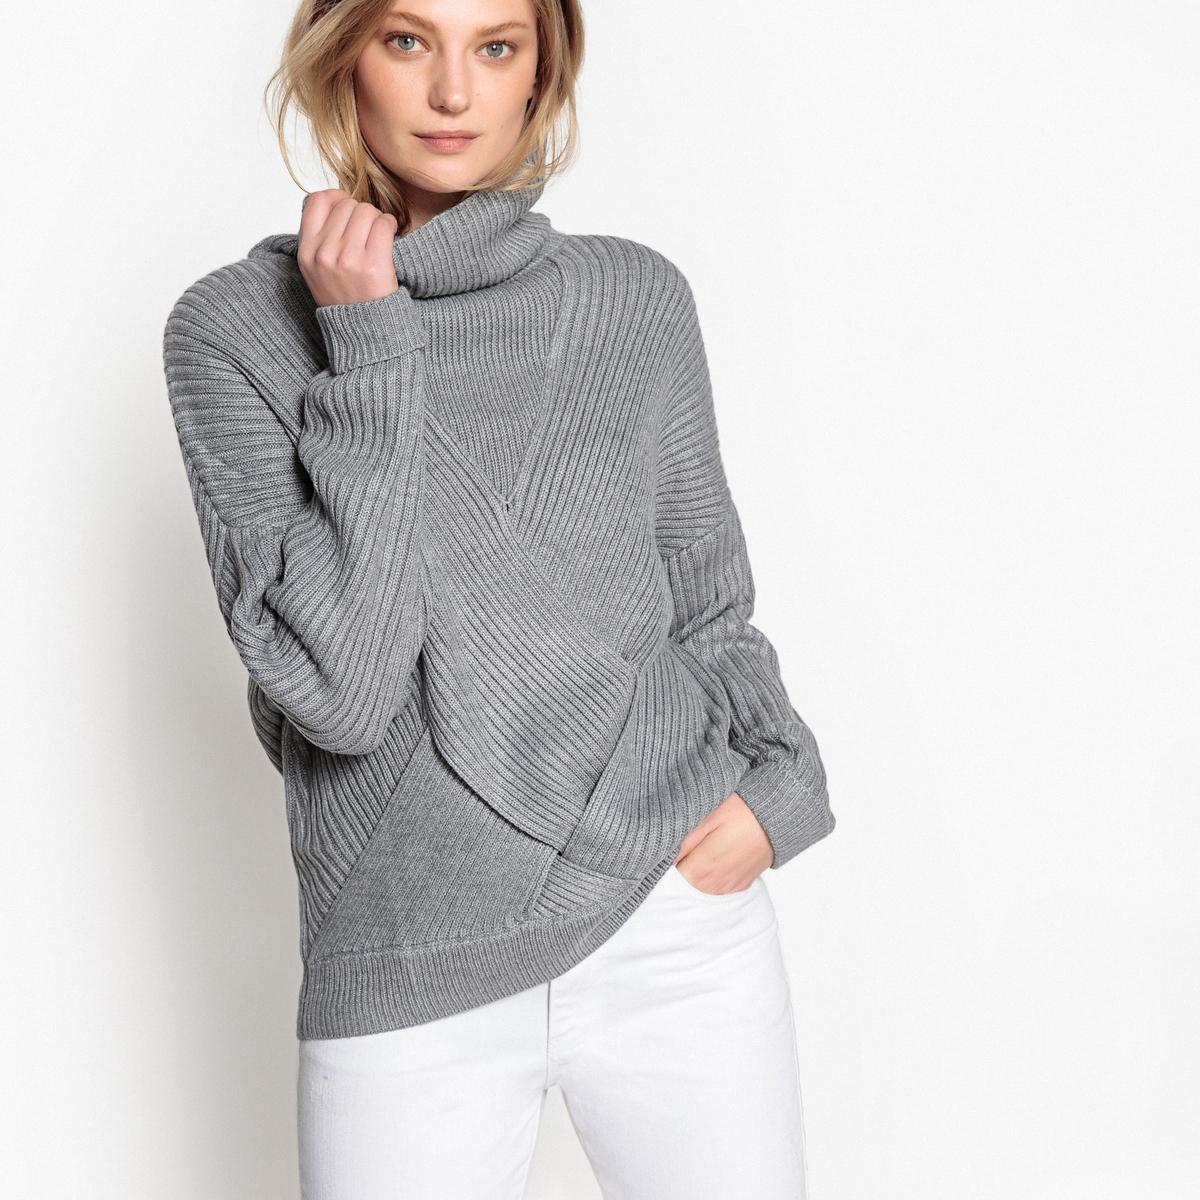 цена на Пуловер-водолазка из тонкого трикотажа